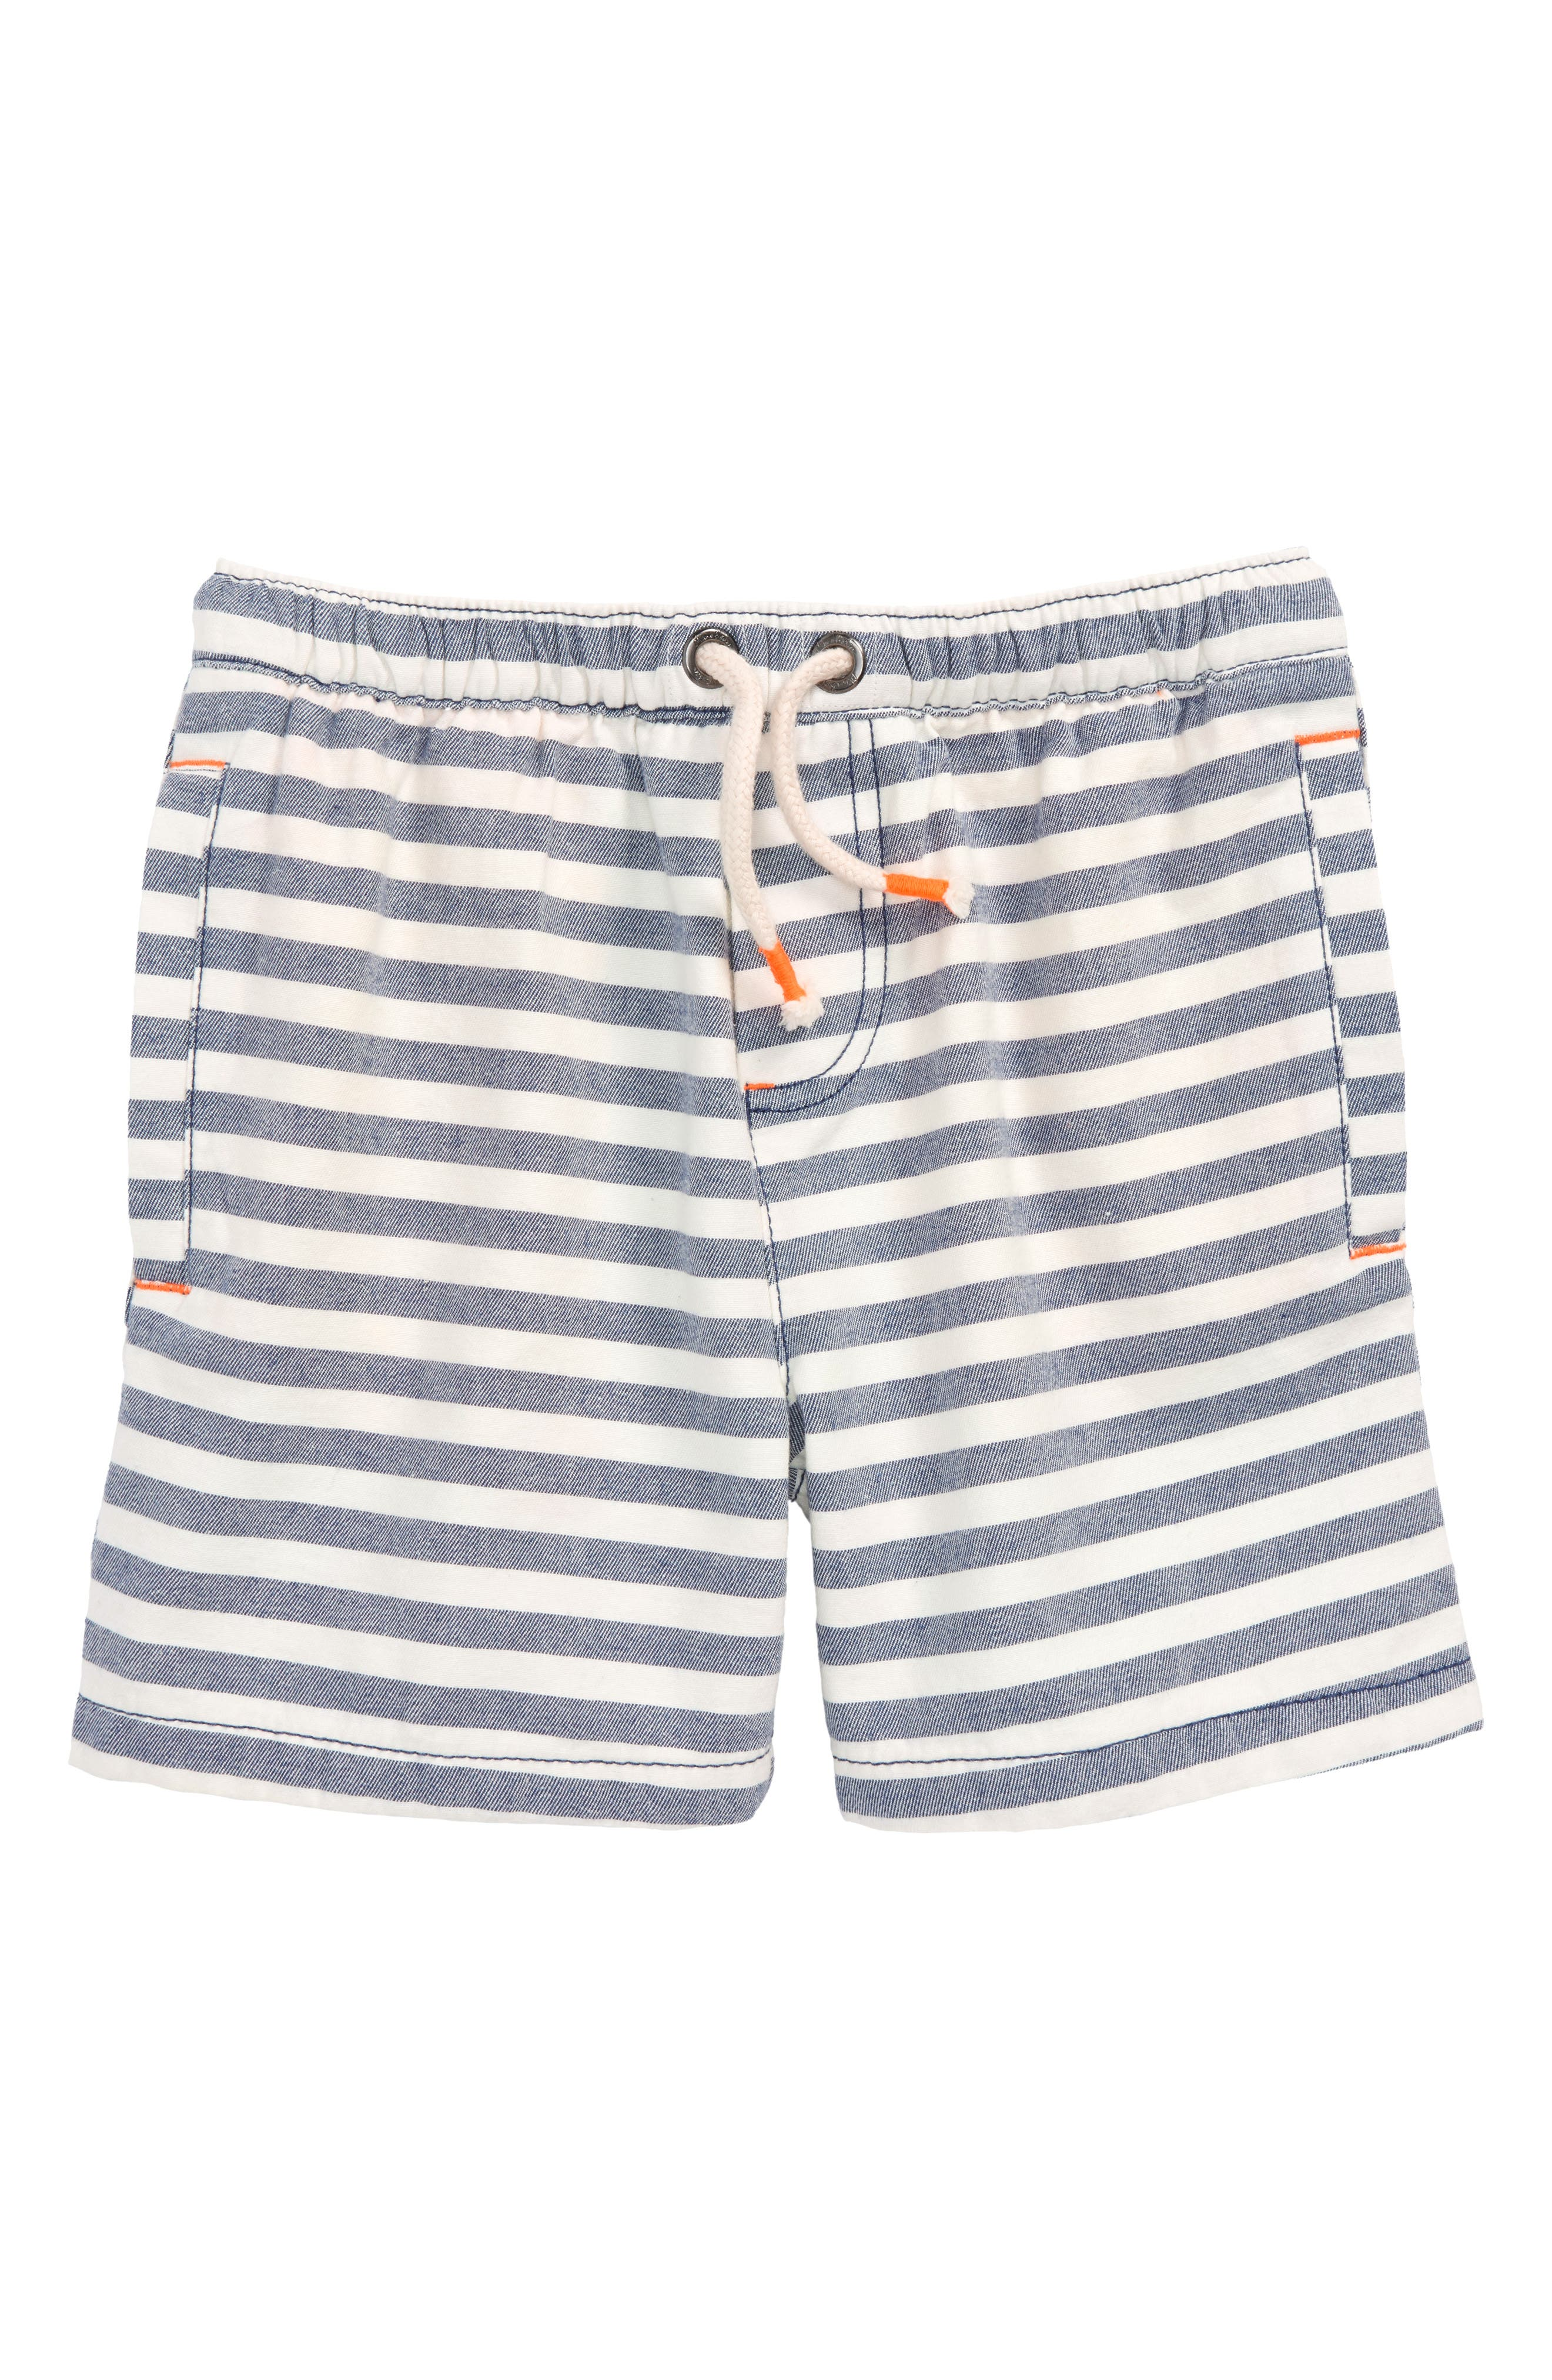 Stripe Drawstring Shorts,                         Main,                         color, 414